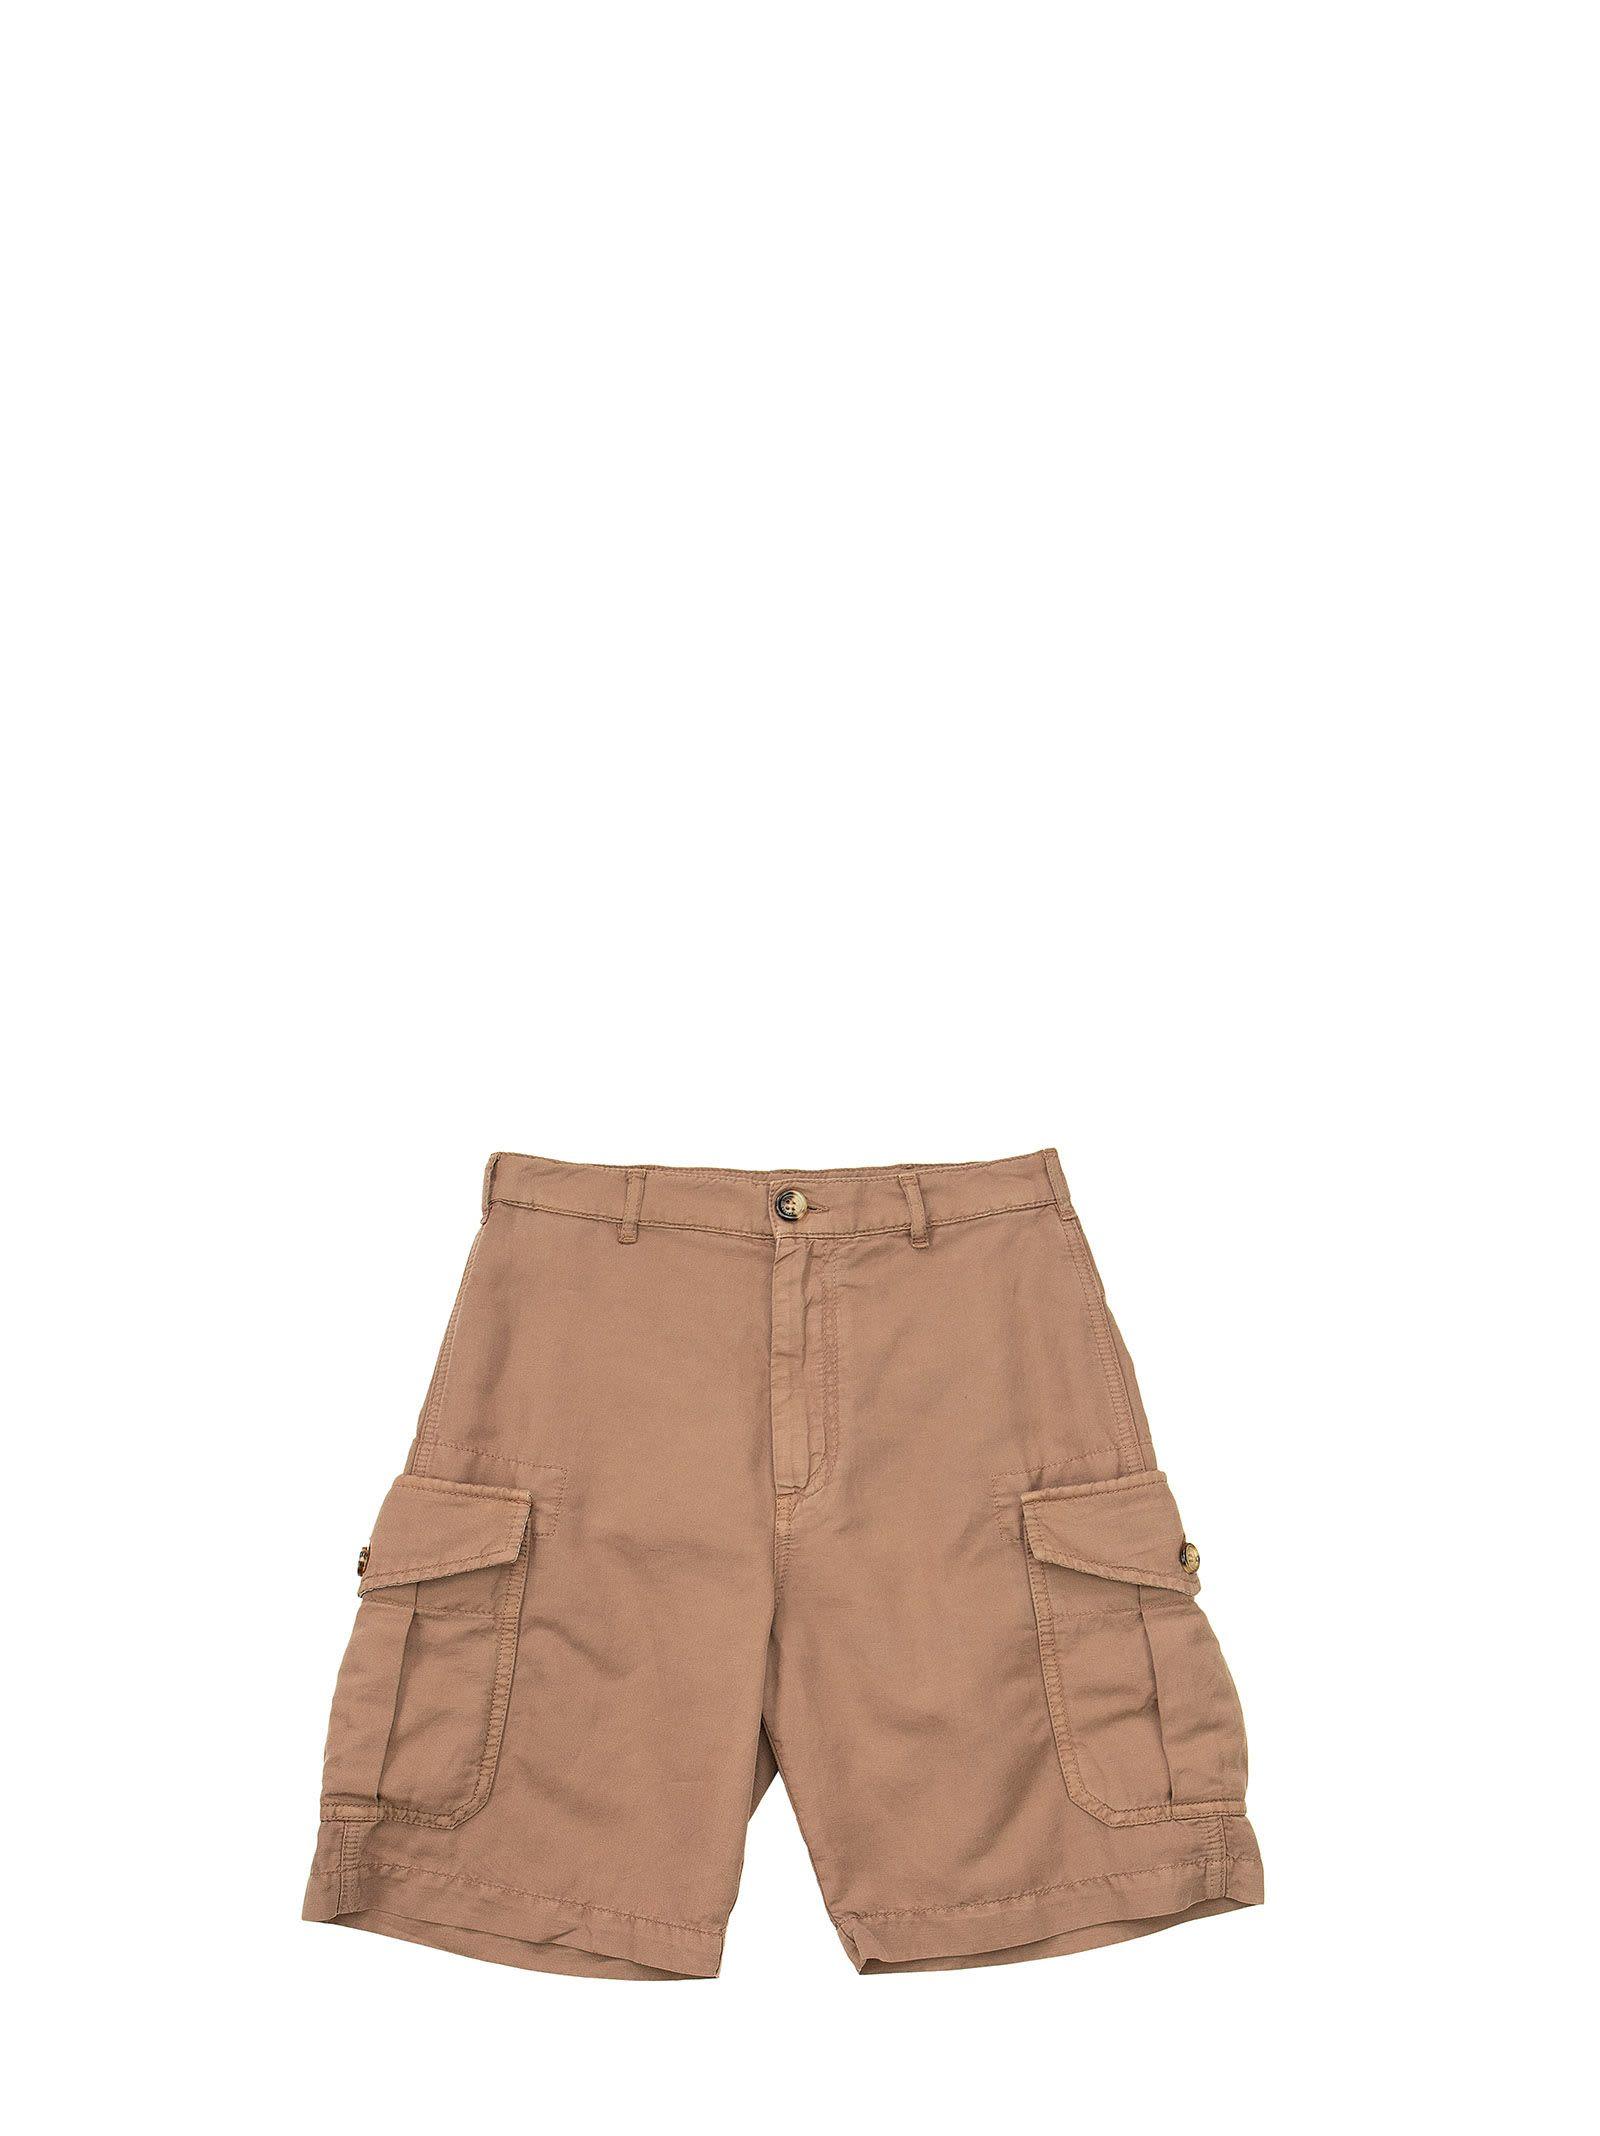 Brunello Cucinelli Garment-dyed Bermuda Shorts In Linen And Cotton Gabardine With Cargo Pockets